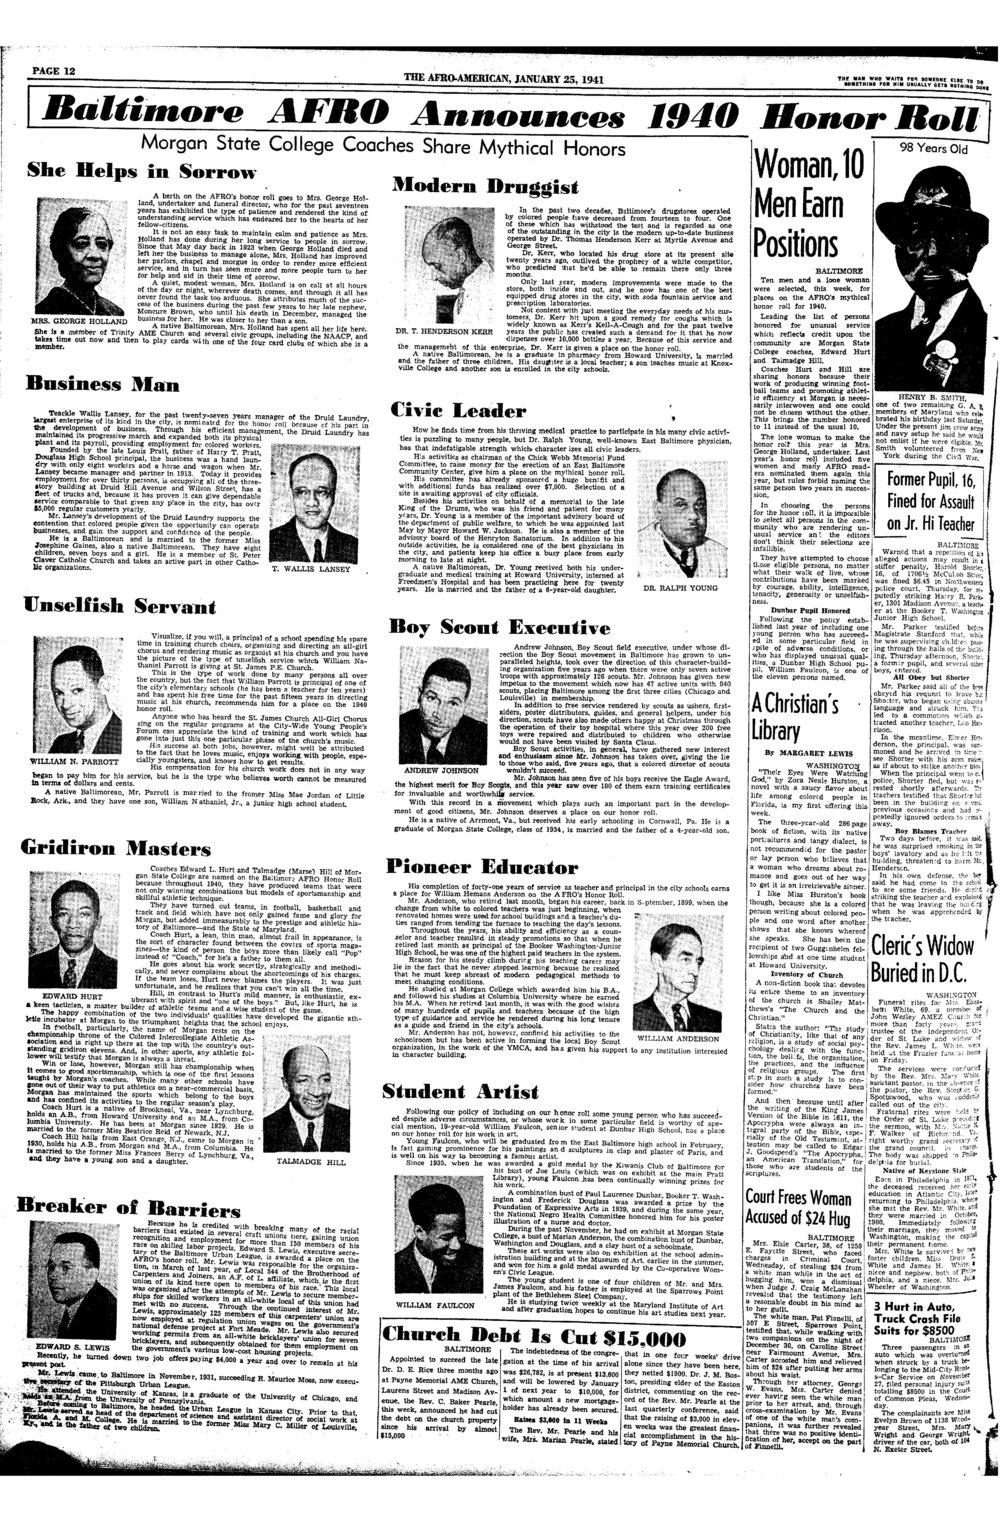 1941-01-25-WilliamFaulconStudiesAtMICA.jpg